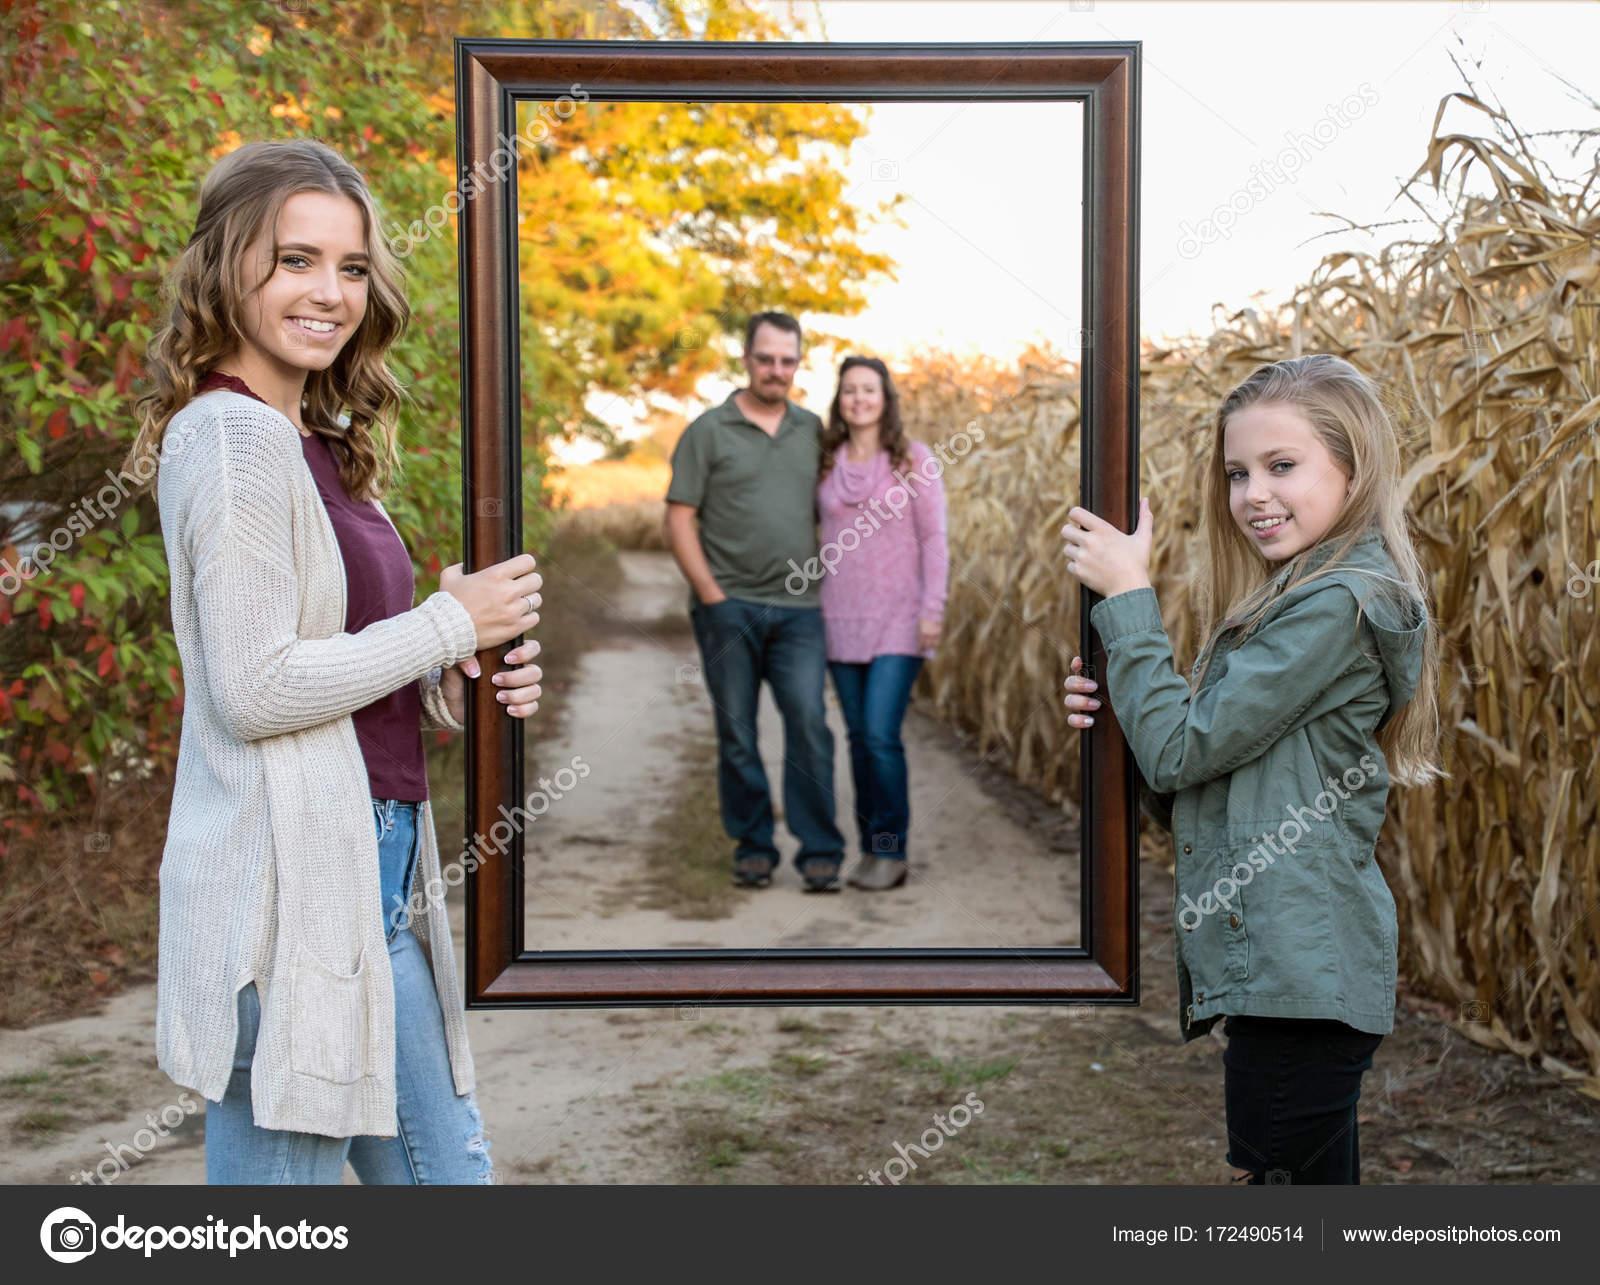 cadre photo de famille finest famille avec cadre photo with cadre photo de famille beautiful. Black Bedroom Furniture Sets. Home Design Ideas